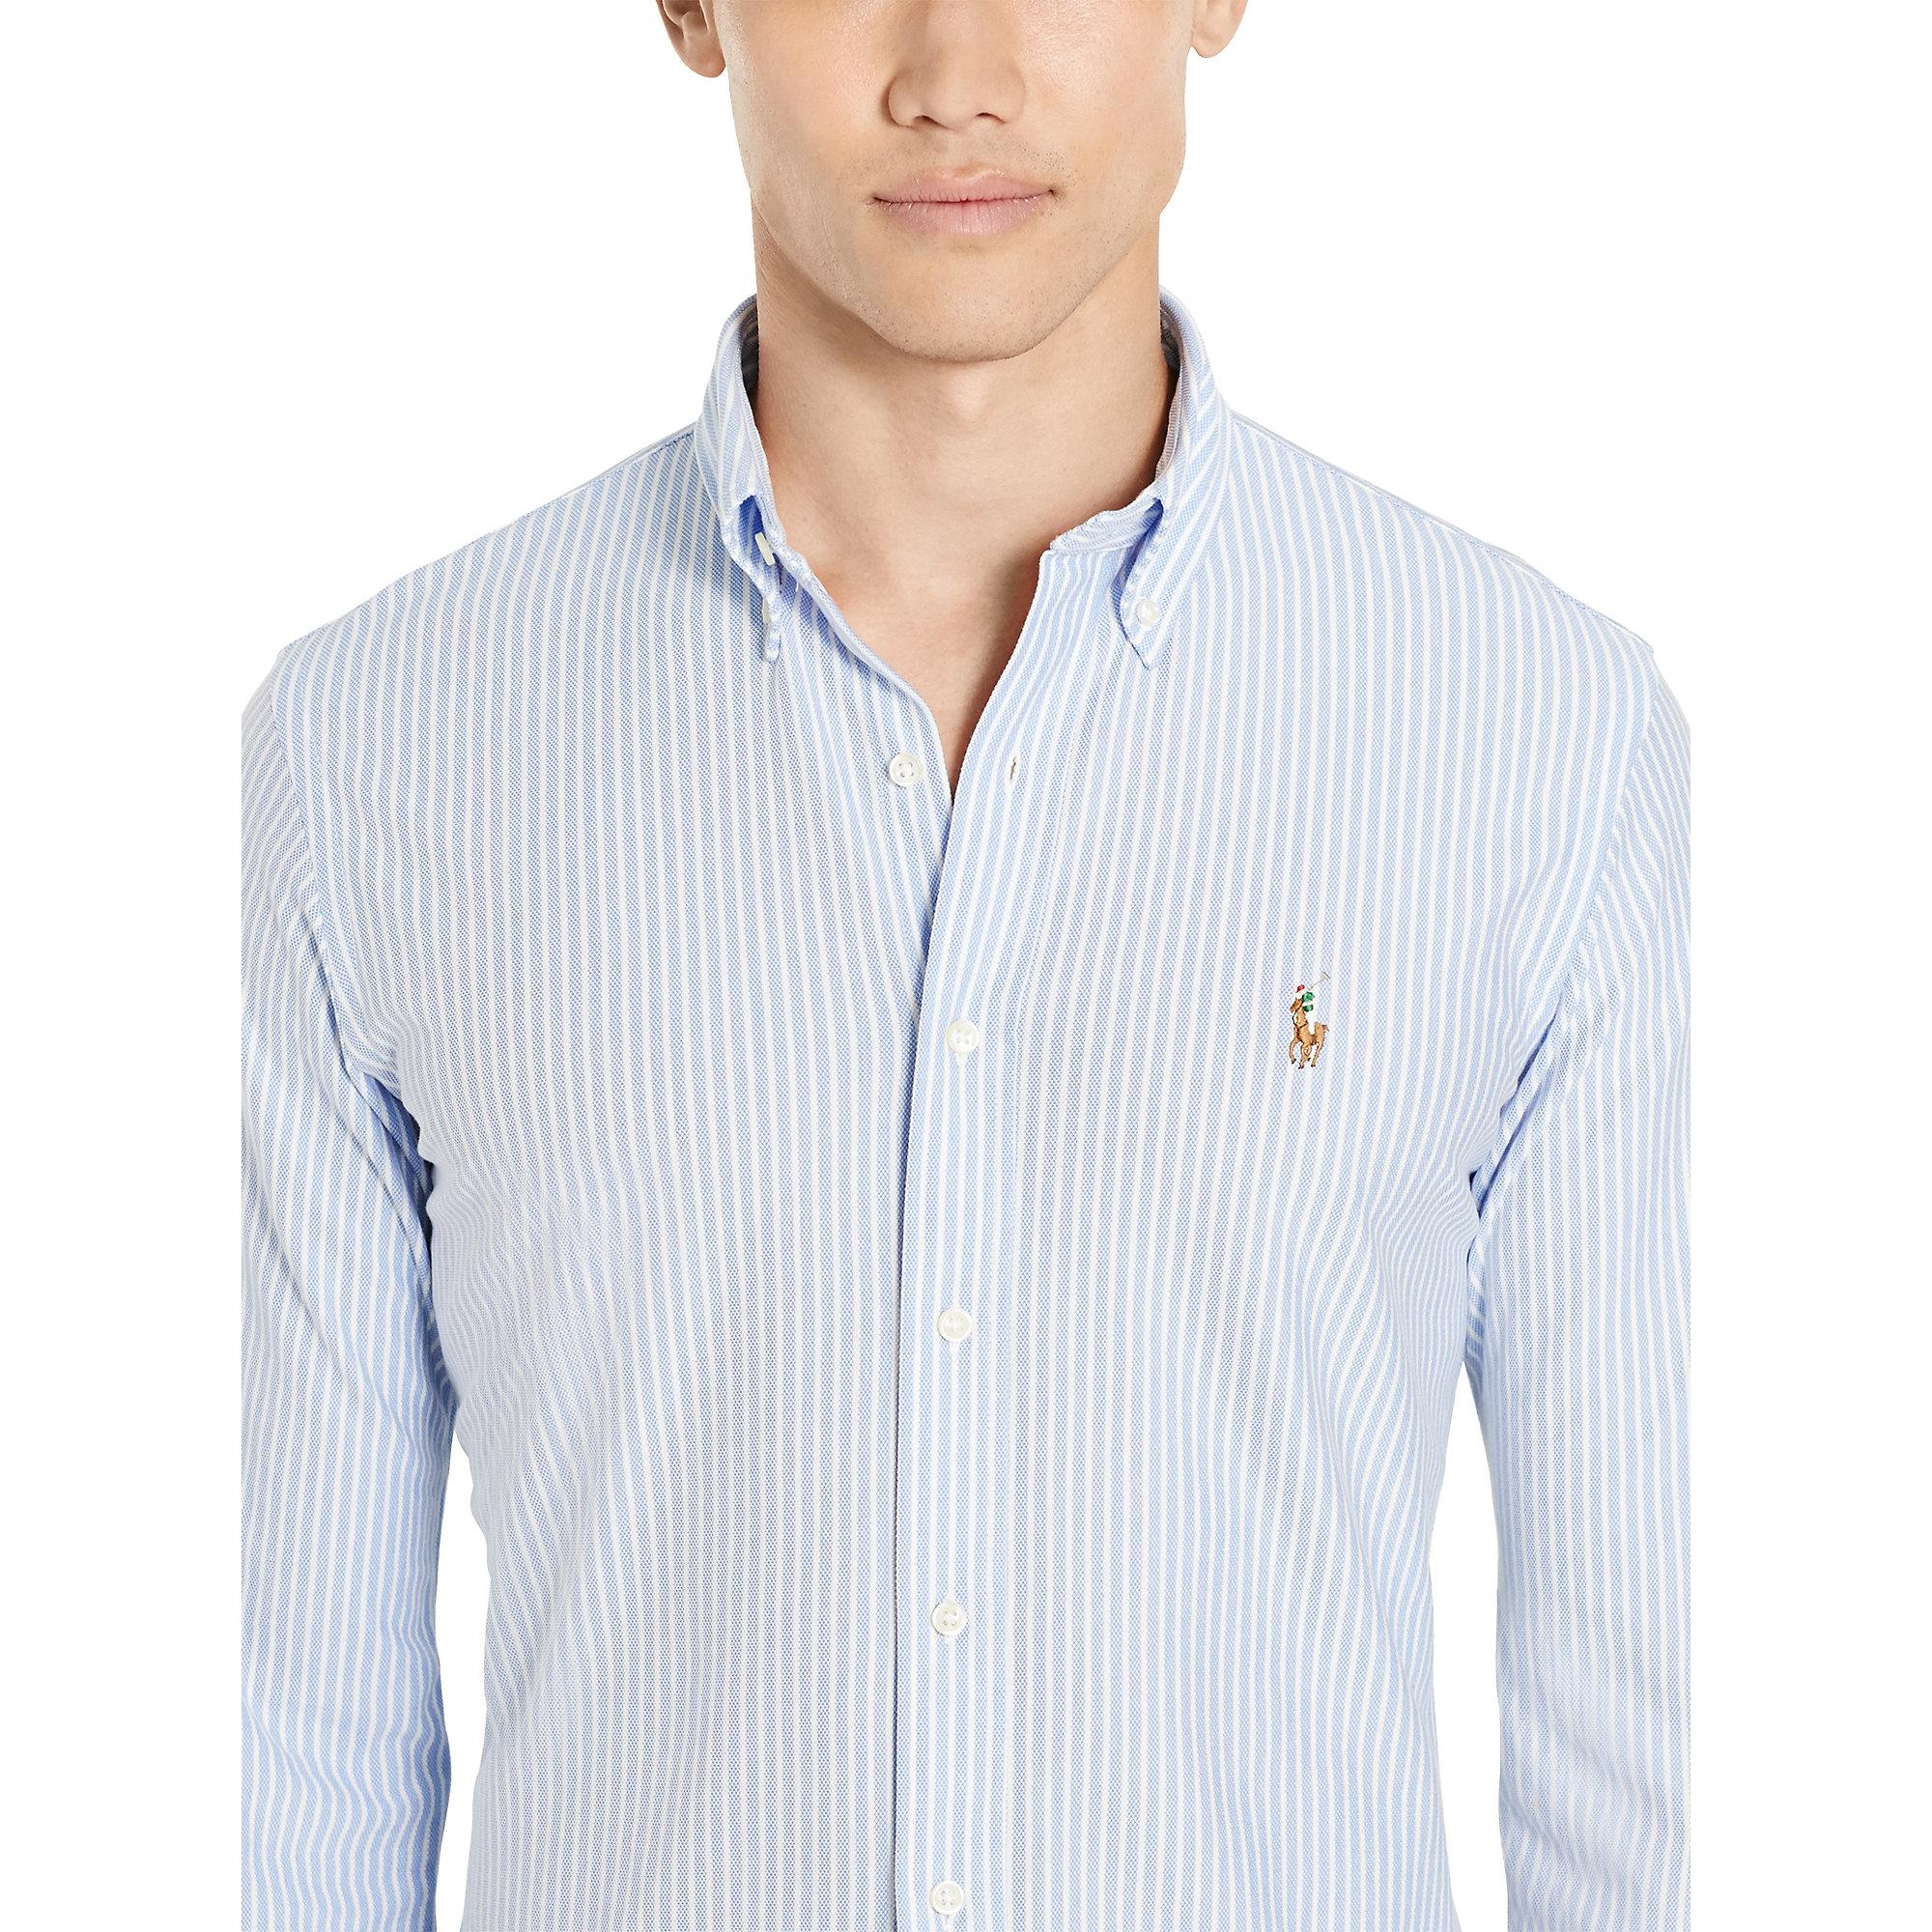 fe2e5b466703 Polo Ralph Lauren Slim Striped Knit Oxford Shirt in Blue for Men - Lyst